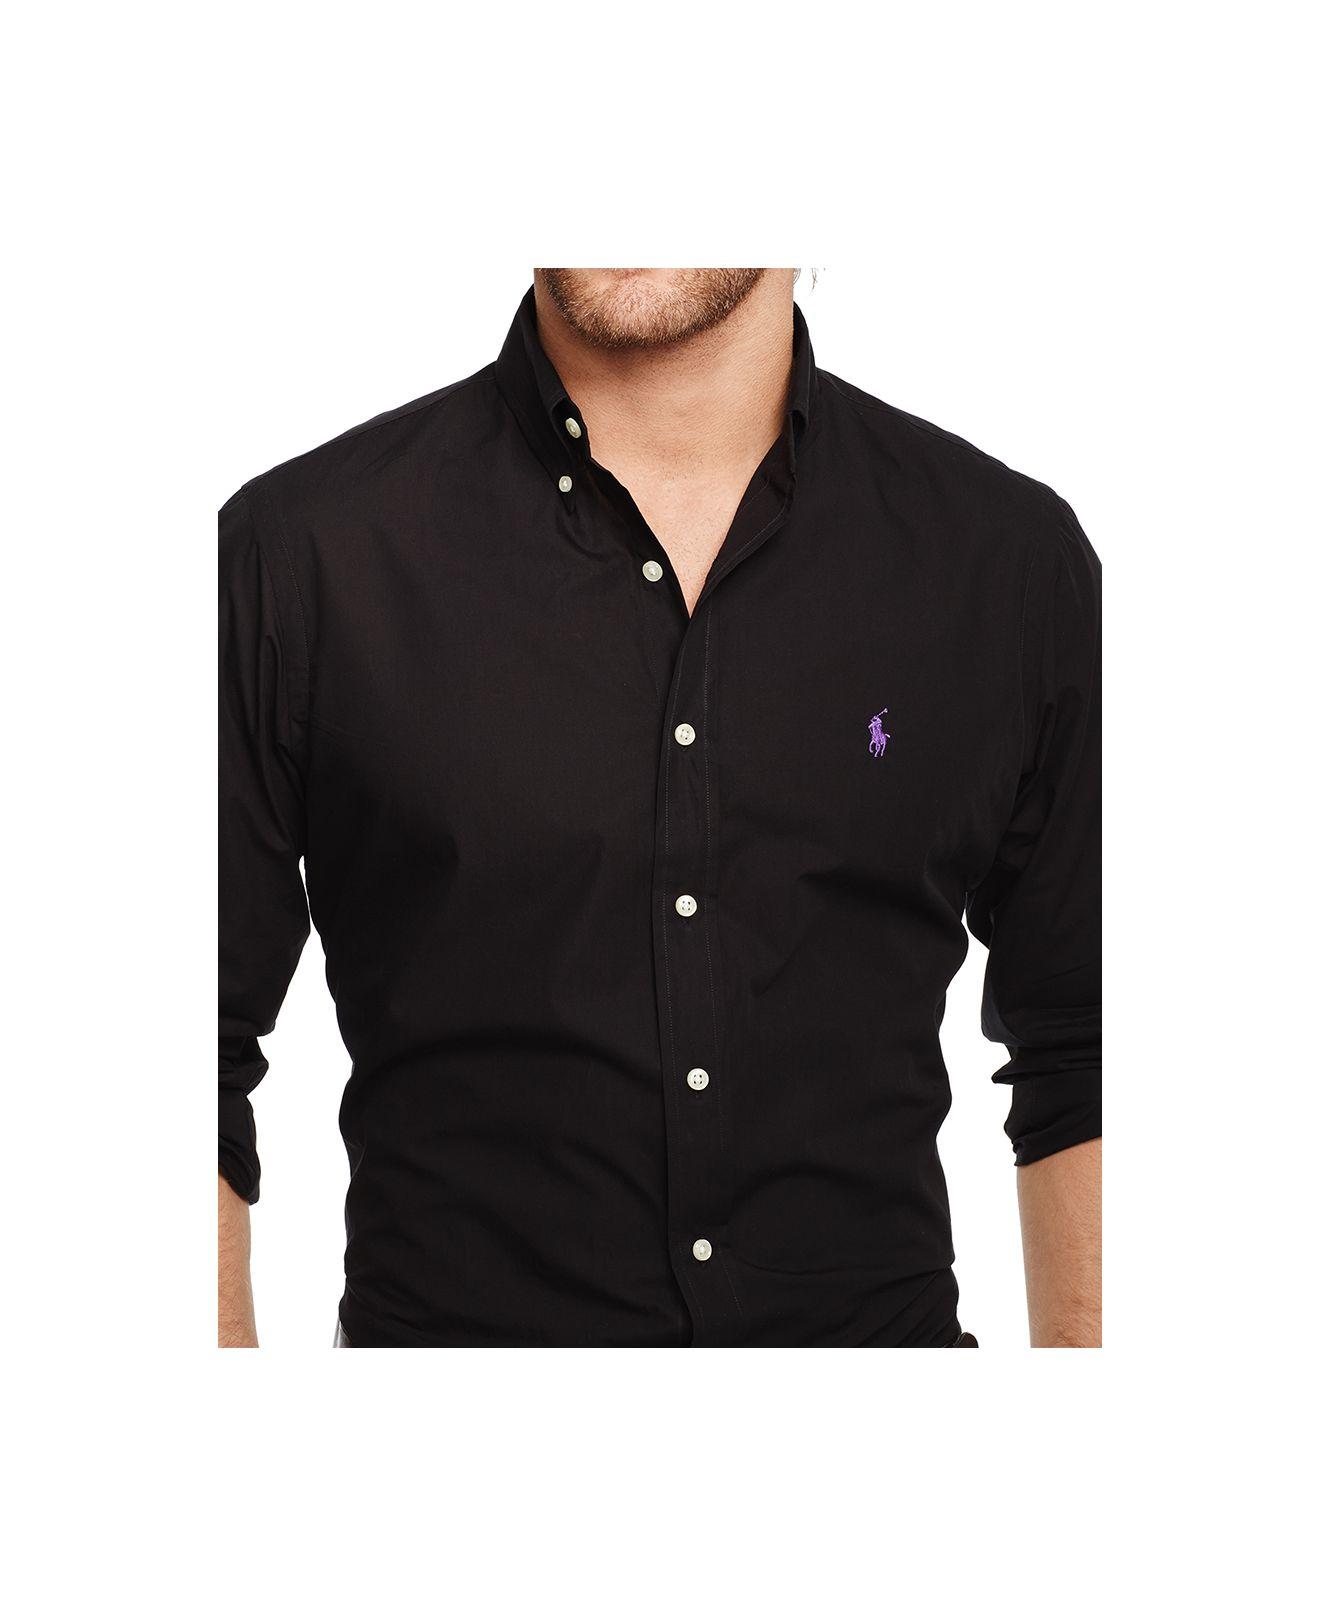 5e980b195 ... discount lyst polo ralph lauren mens slim fit poplin shirt in black for  men d16de 67748